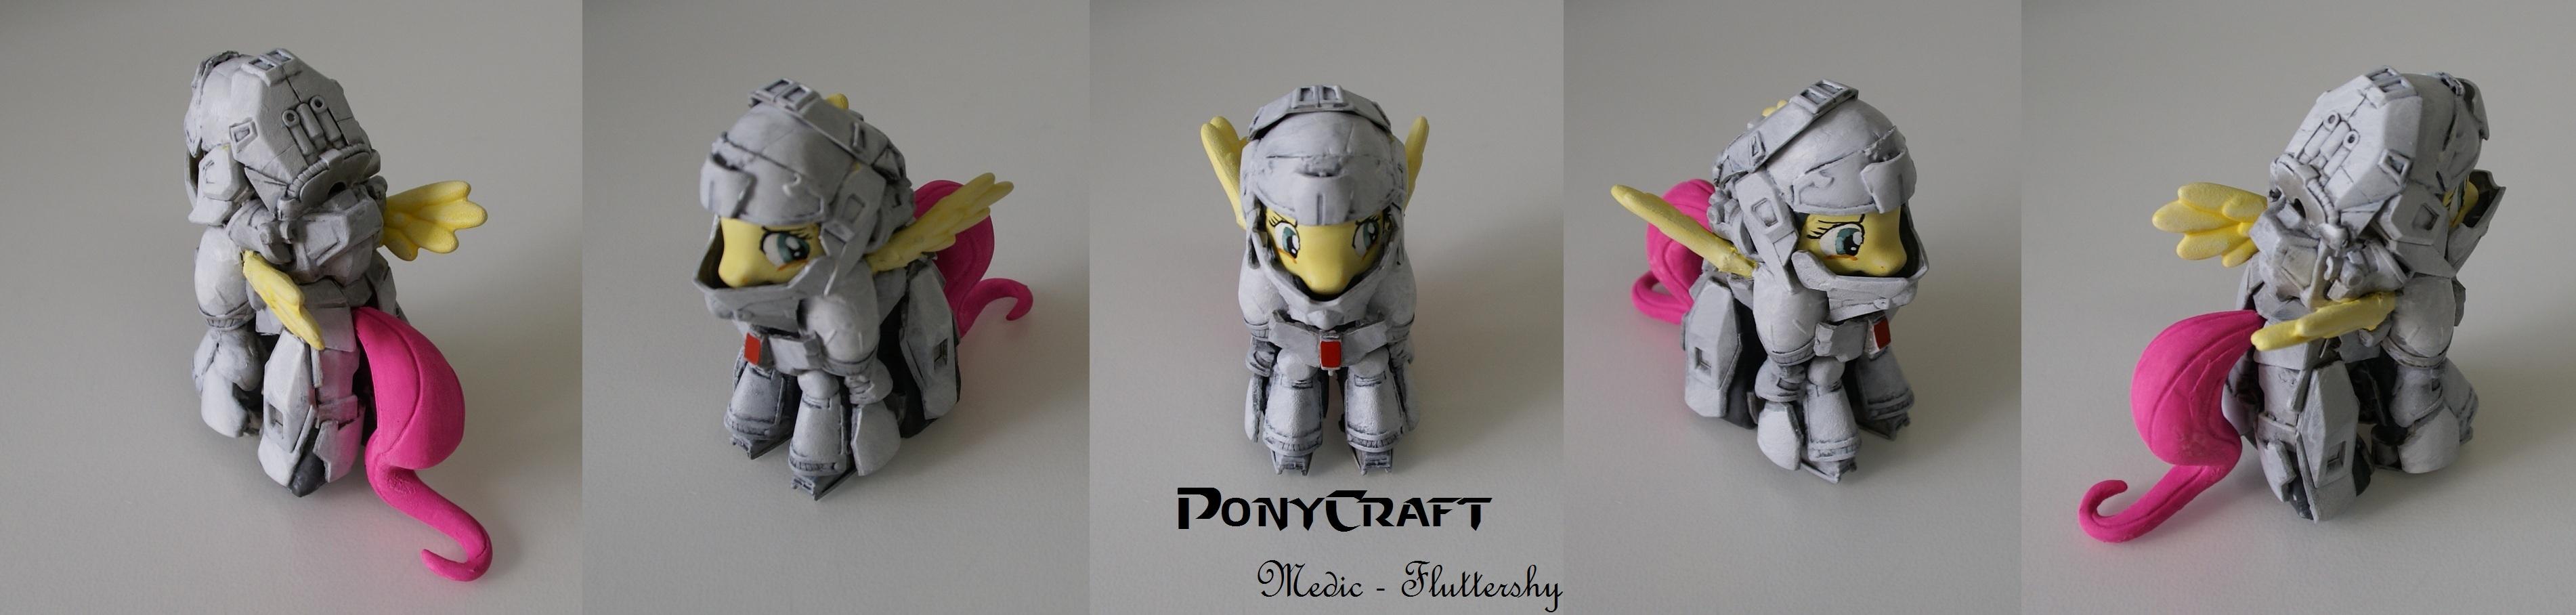 ponycraft_fluttermedic_by_azurevine-d4n3eqi.jpg